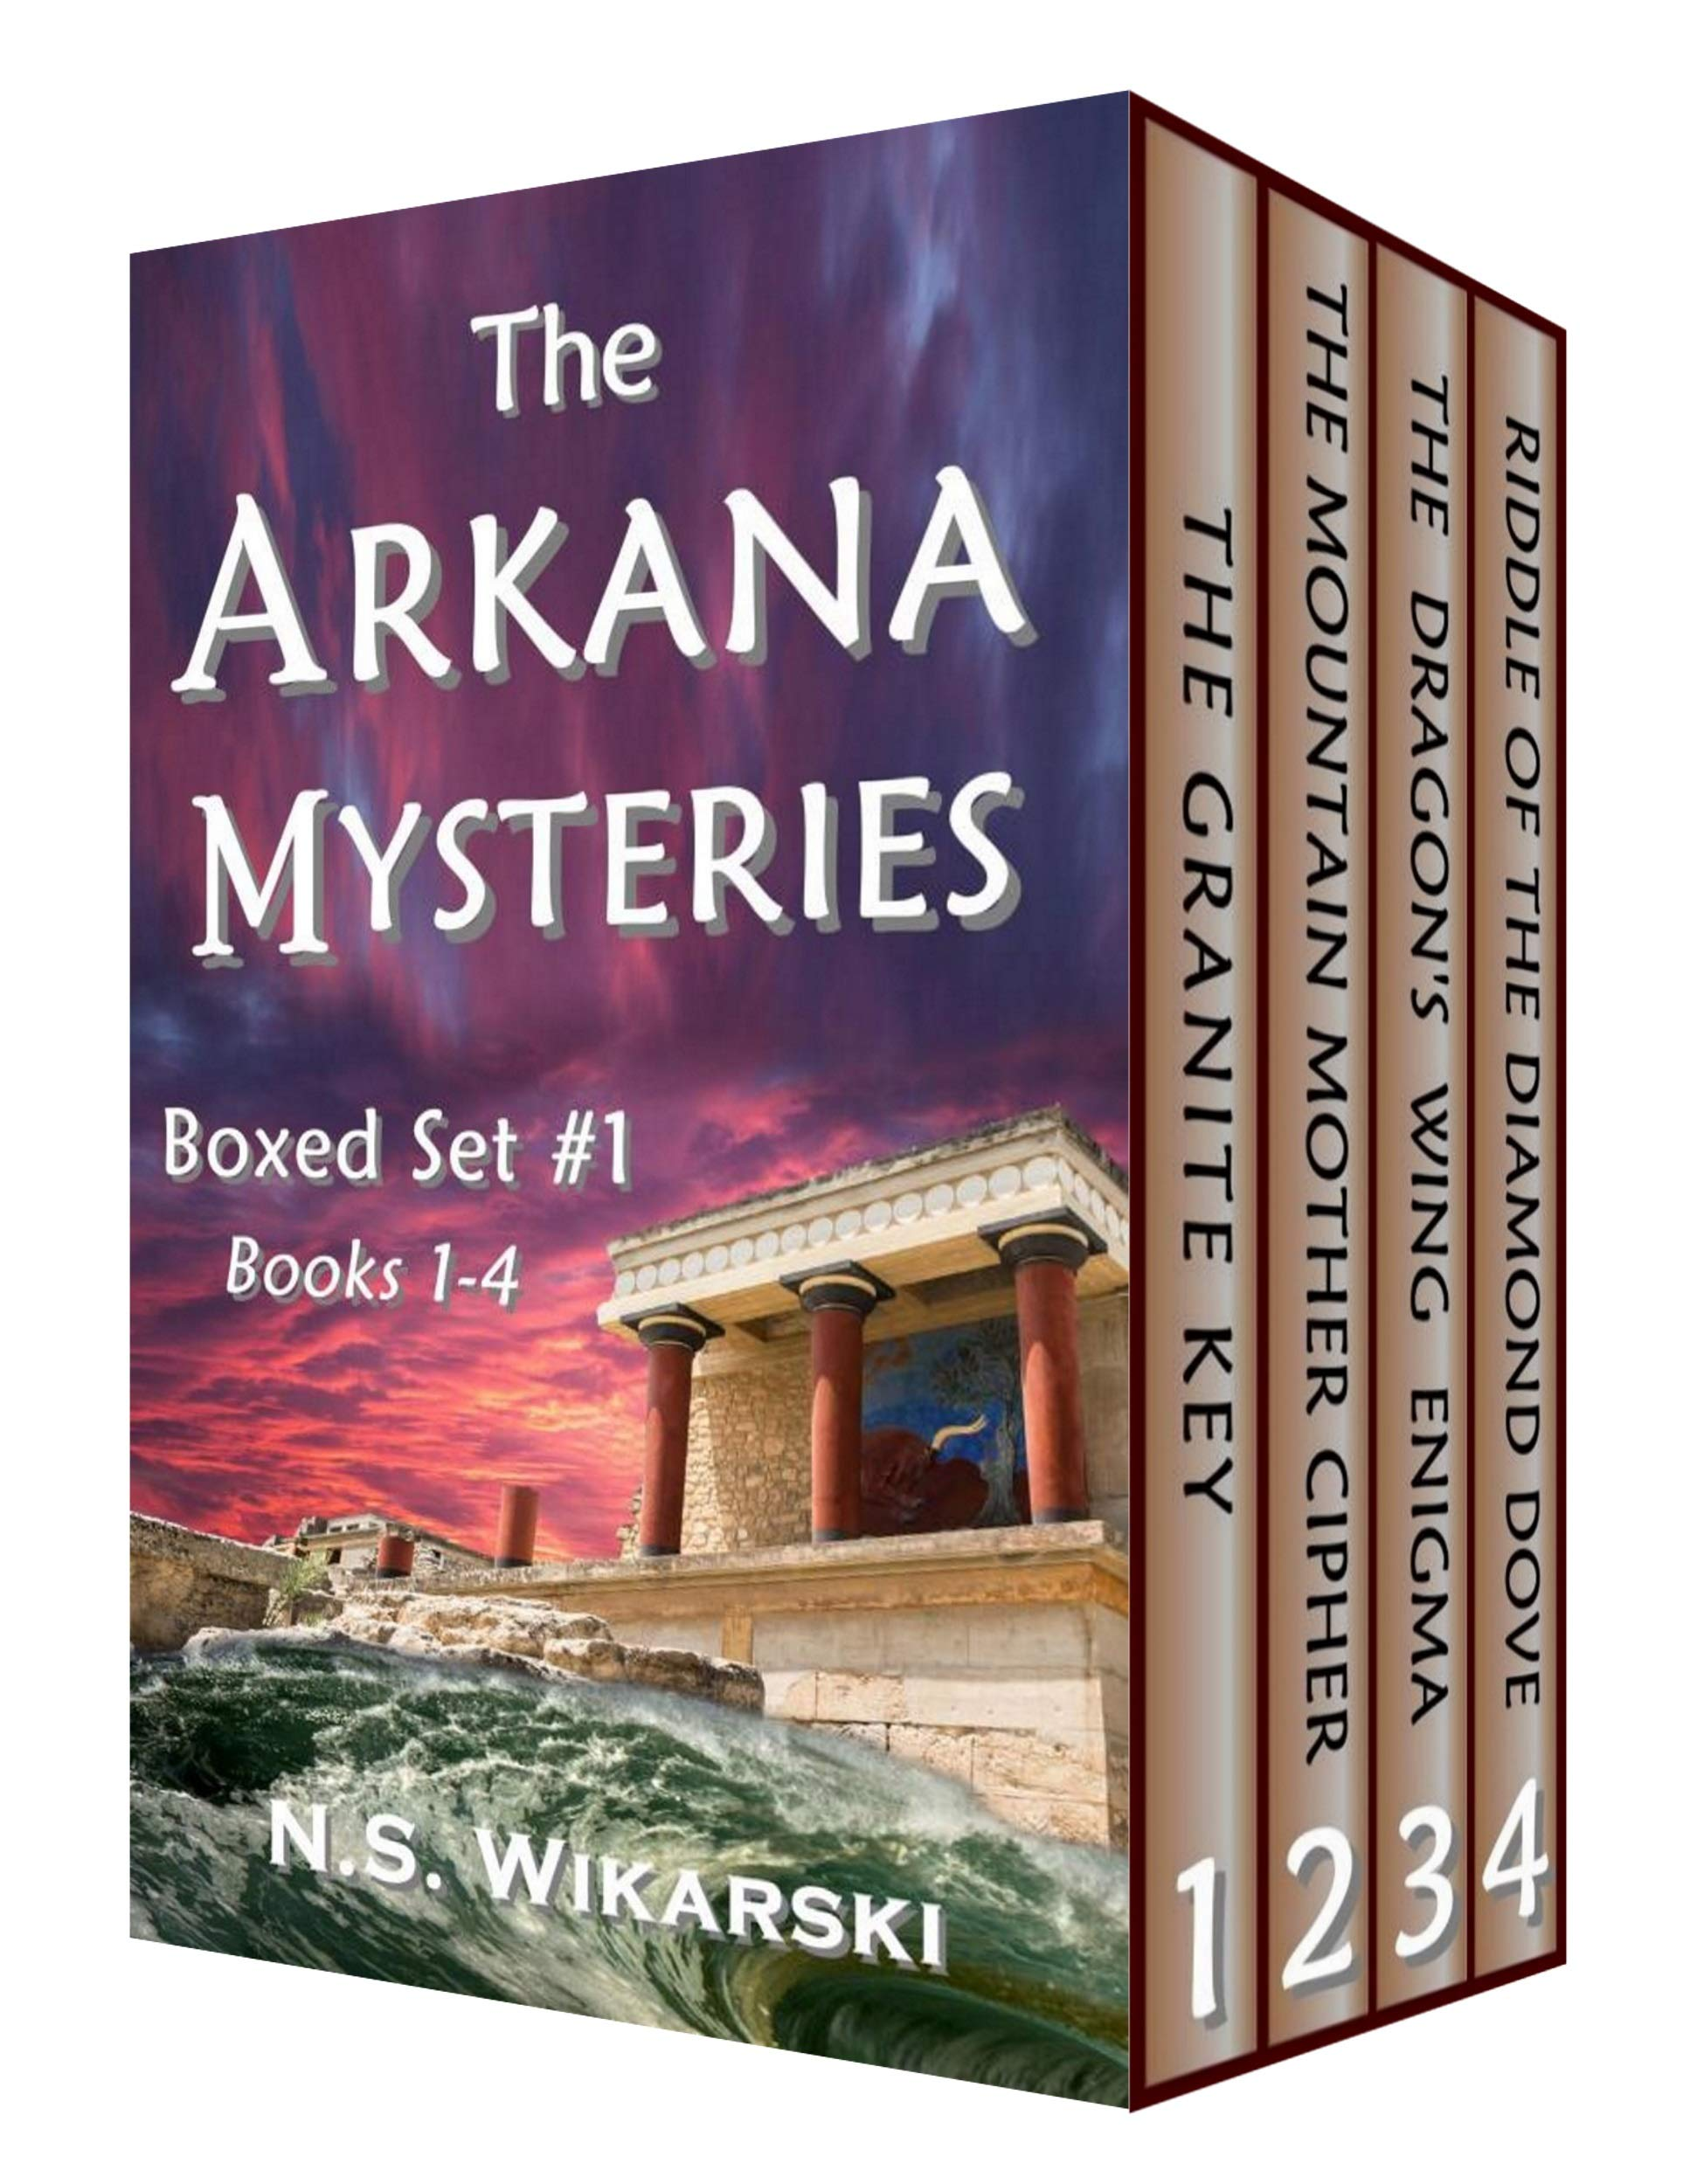 The Arkana Mysteries: Boxed Set #1: Books 1-4 (The Arkana Mysteries: Ebook Boxed Set)